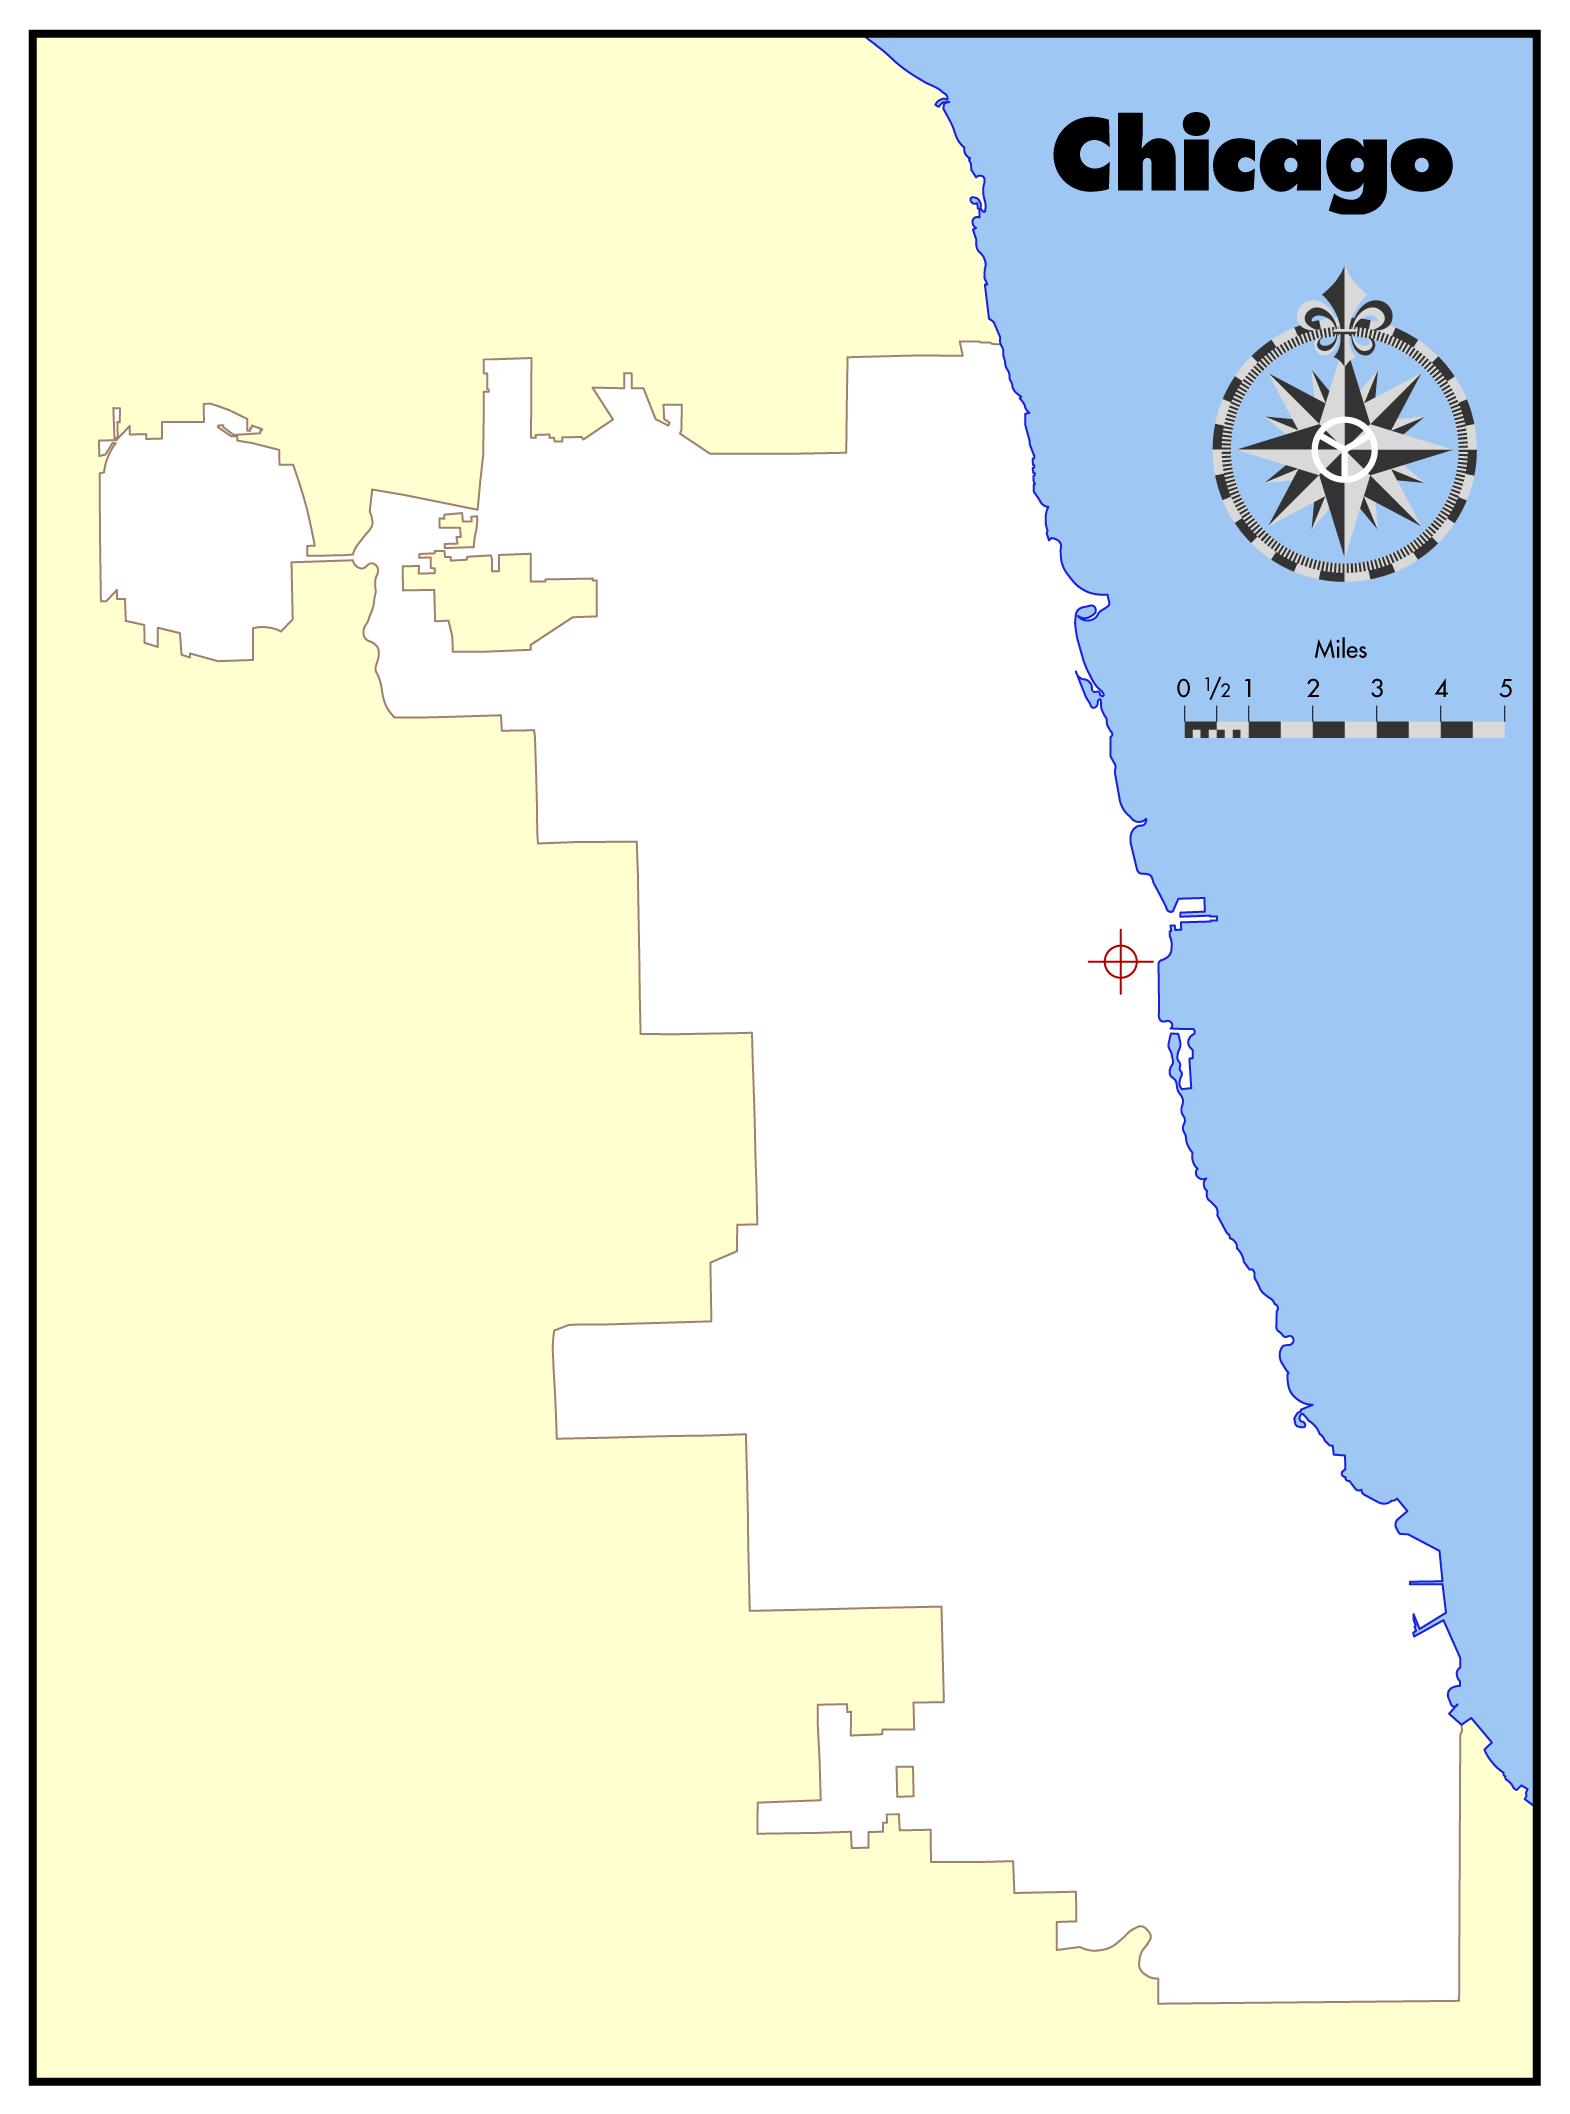 FileChicagomap501blankpng Wikimedia Commons